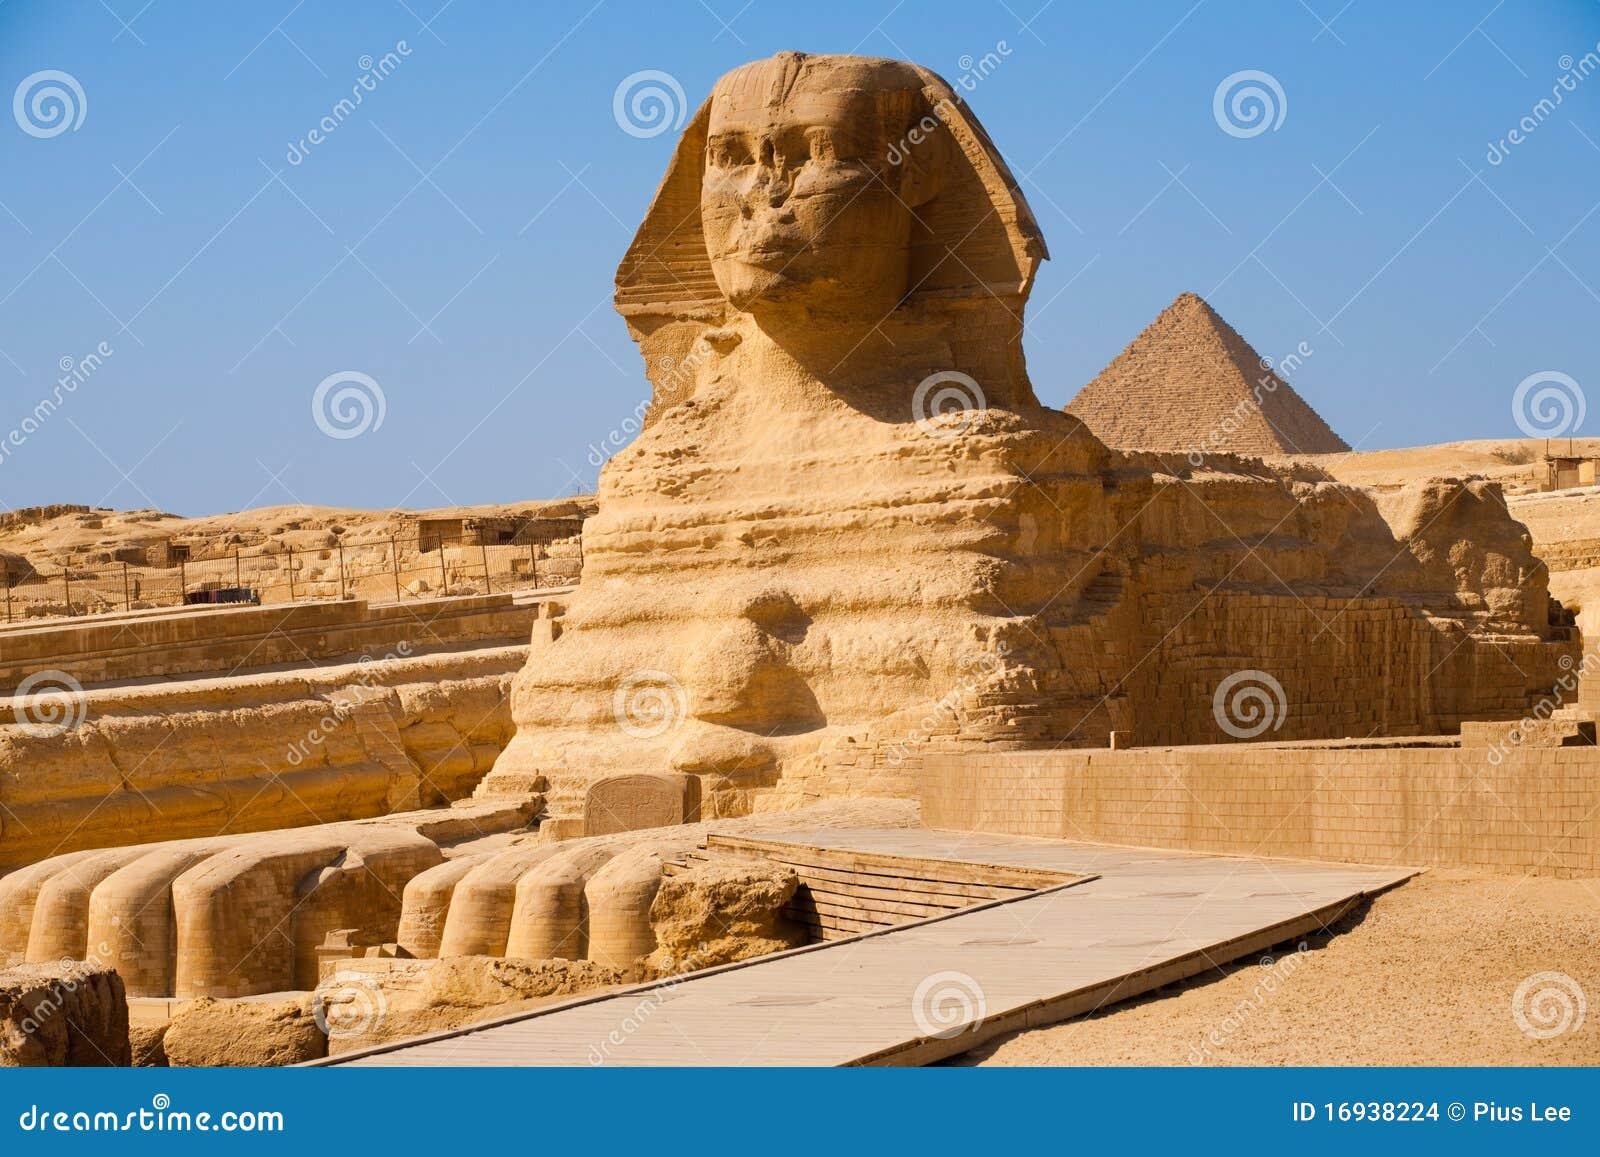 Pleine pyramide Giza Egypte de profil de sphinx